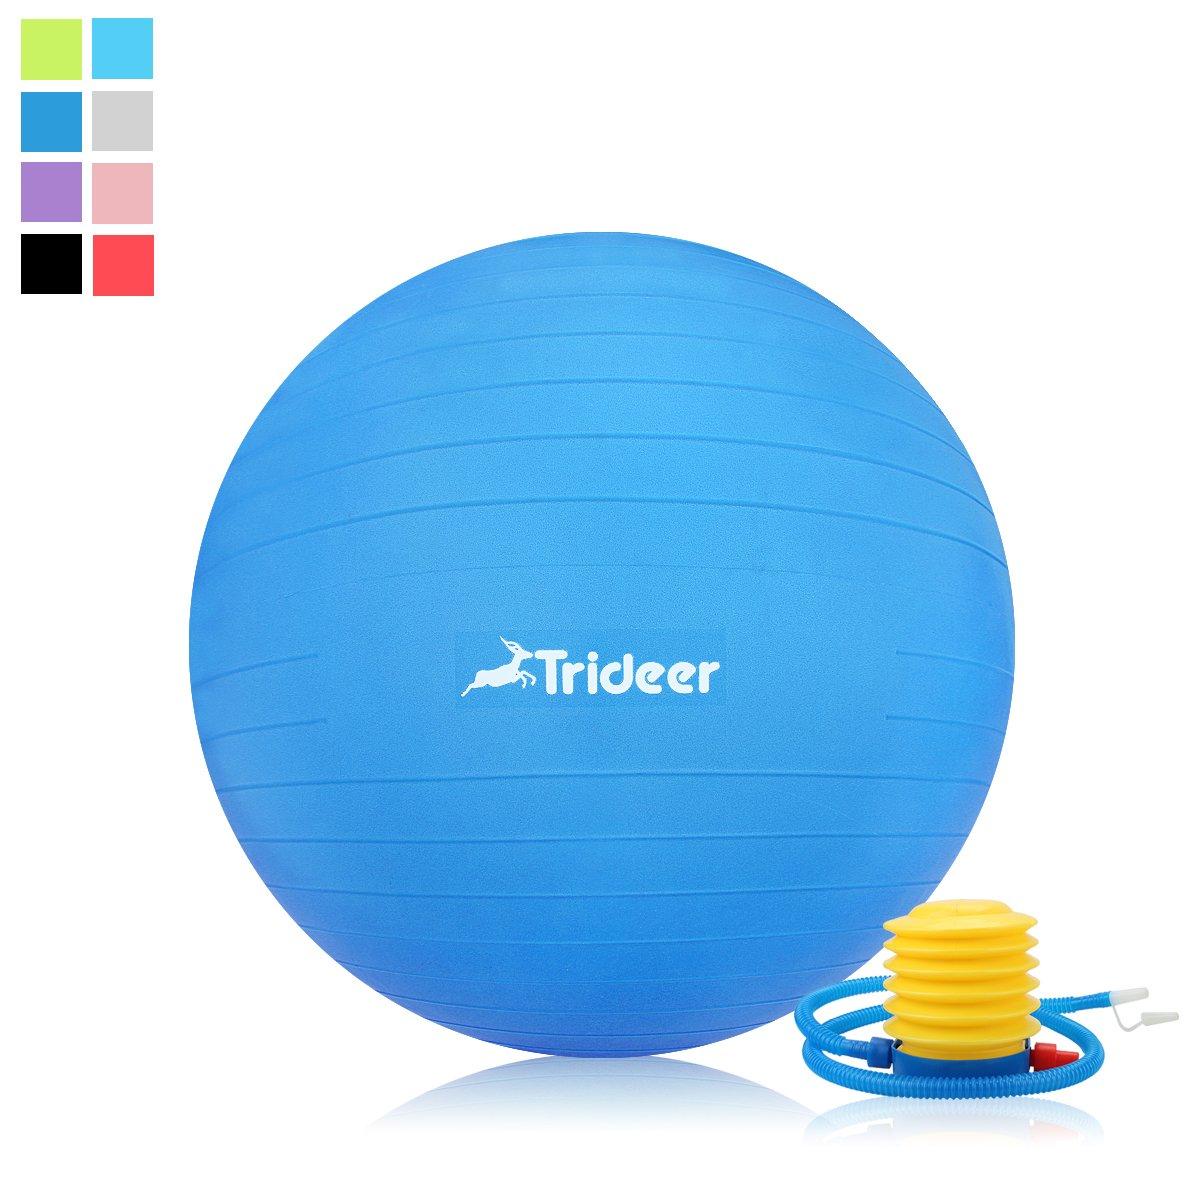 Trideer 45-85cm Exercise Ball, Birthing Ball, Ball Chair, Yoga Pilate Fitness Balance Ball with Pump Plug Kit, Anti-Slip & Anti-Burst (Dark Blue, 65cm) by Trideer (Image #2)